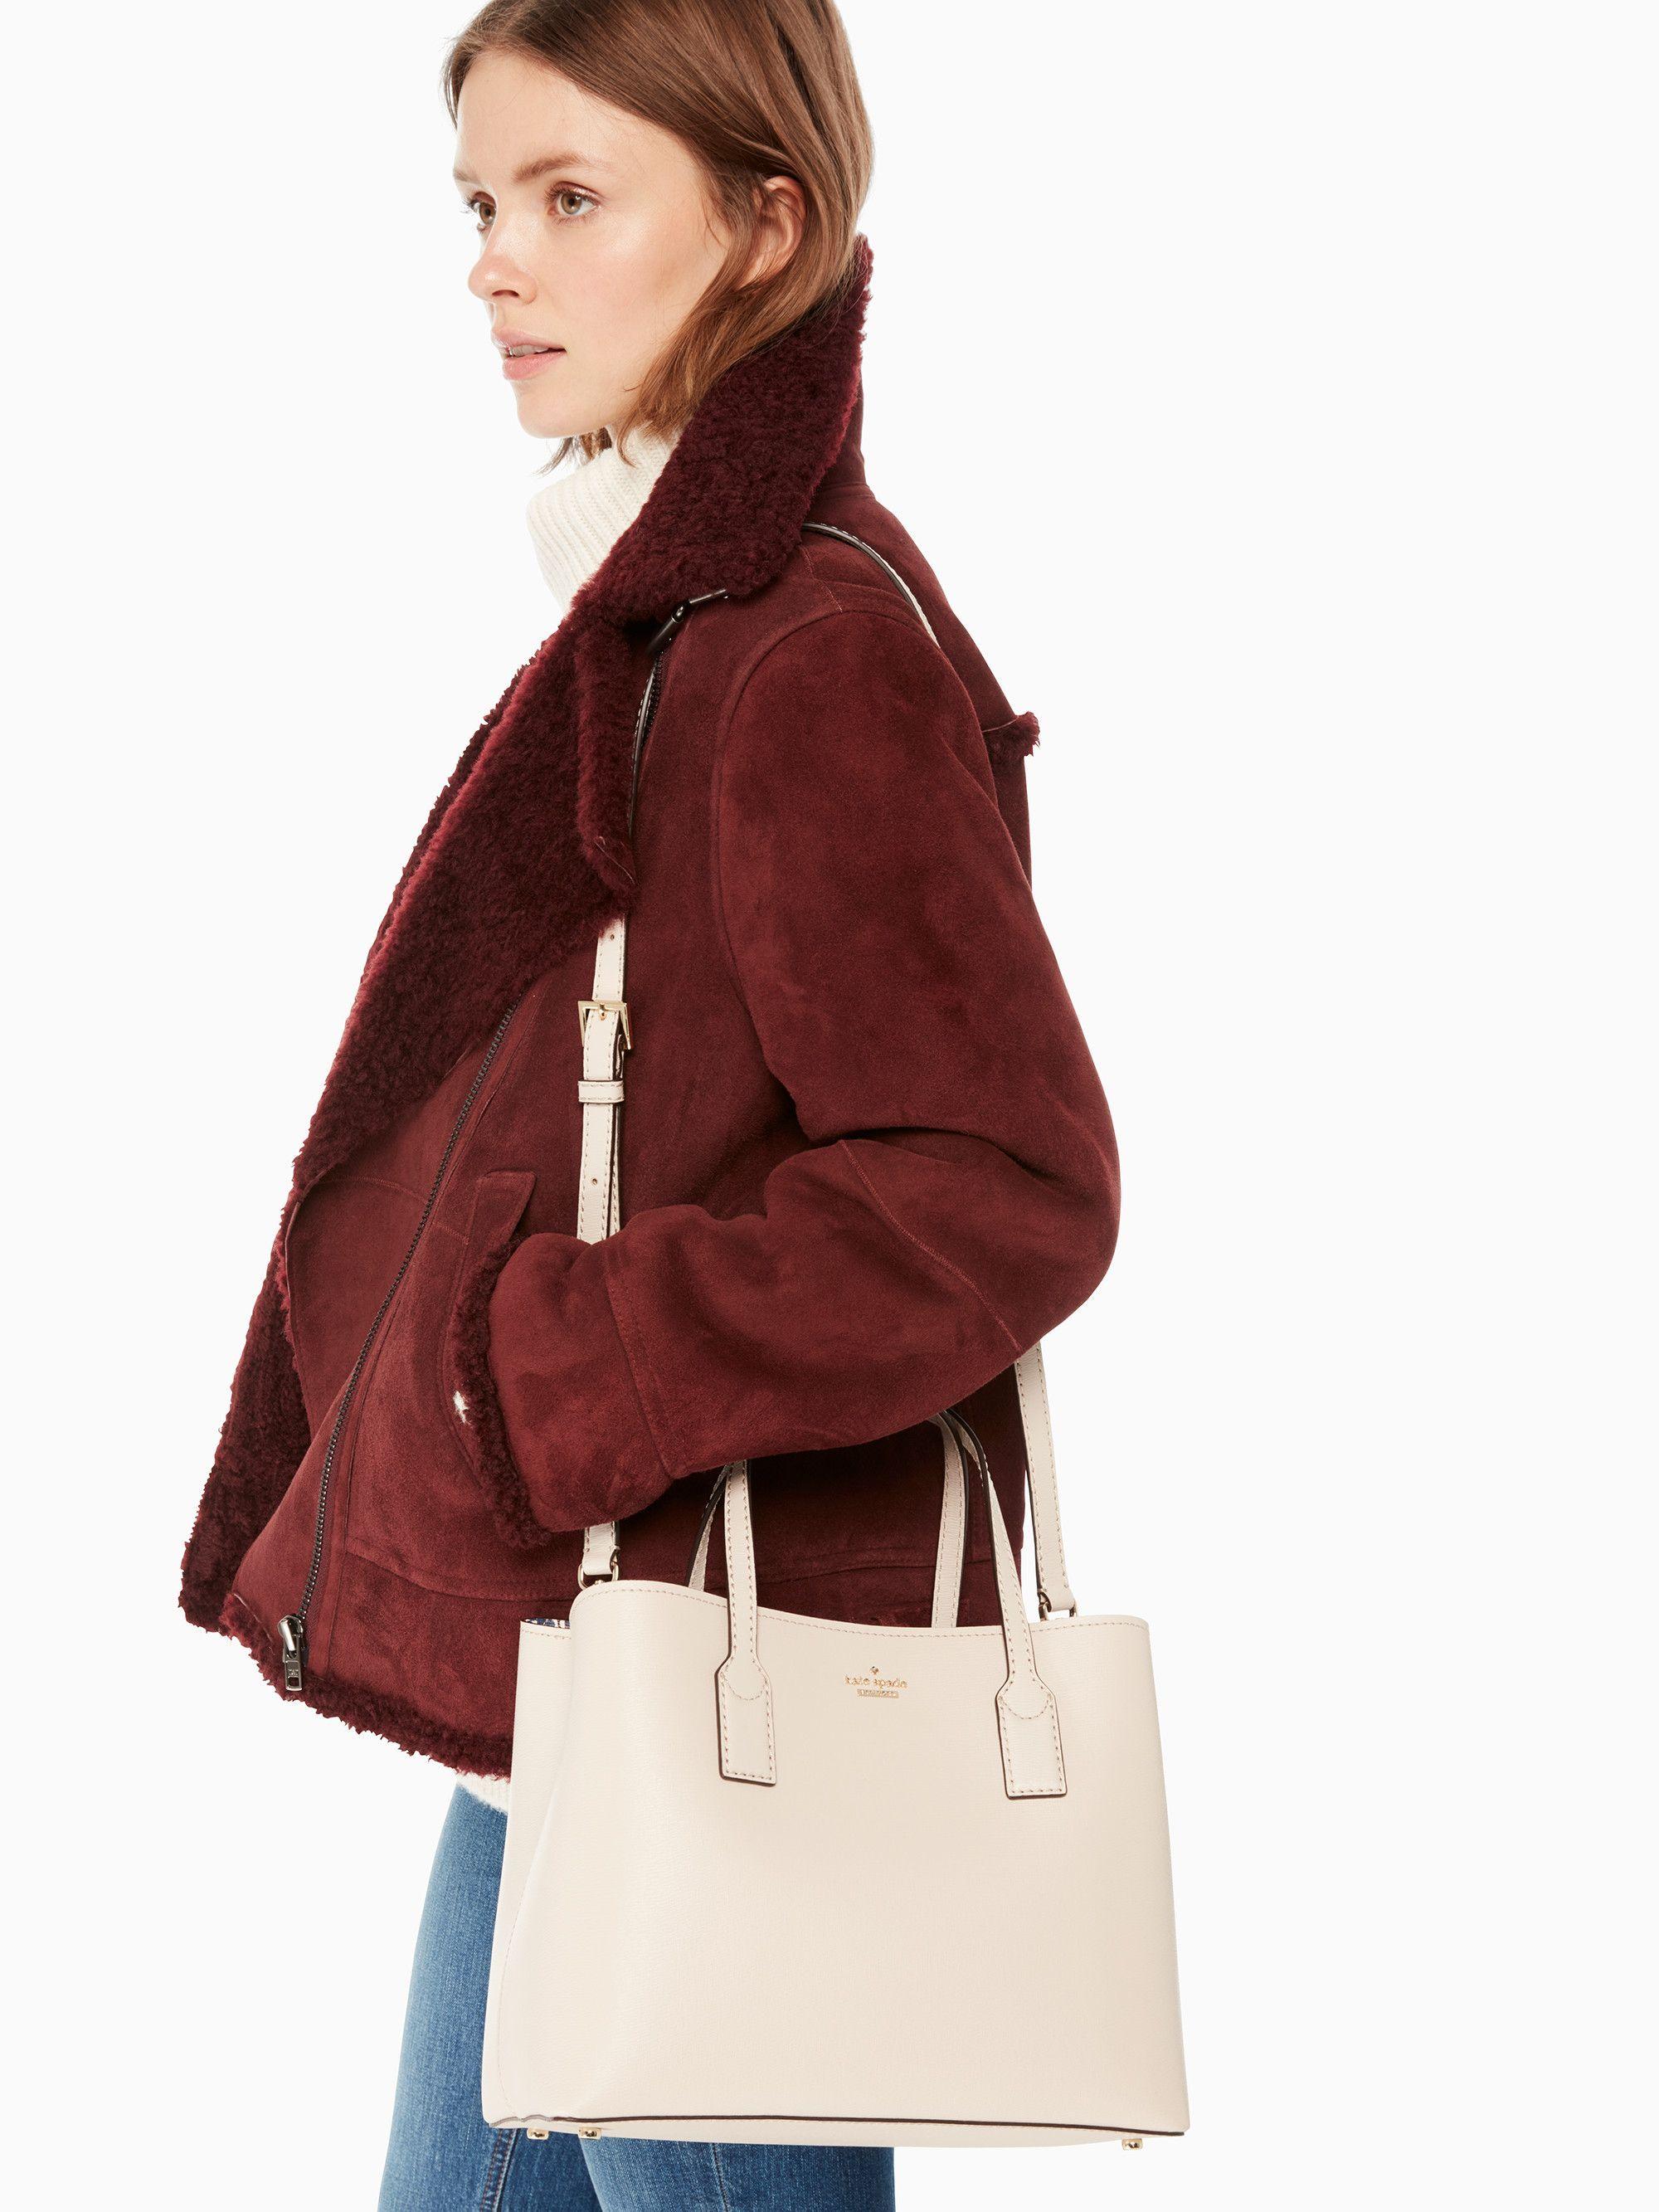 203726c5cdc2 Kate Spade Hadley Road Small Dina Crossbody Bag - Tusk  katespade   crossbody  springbags